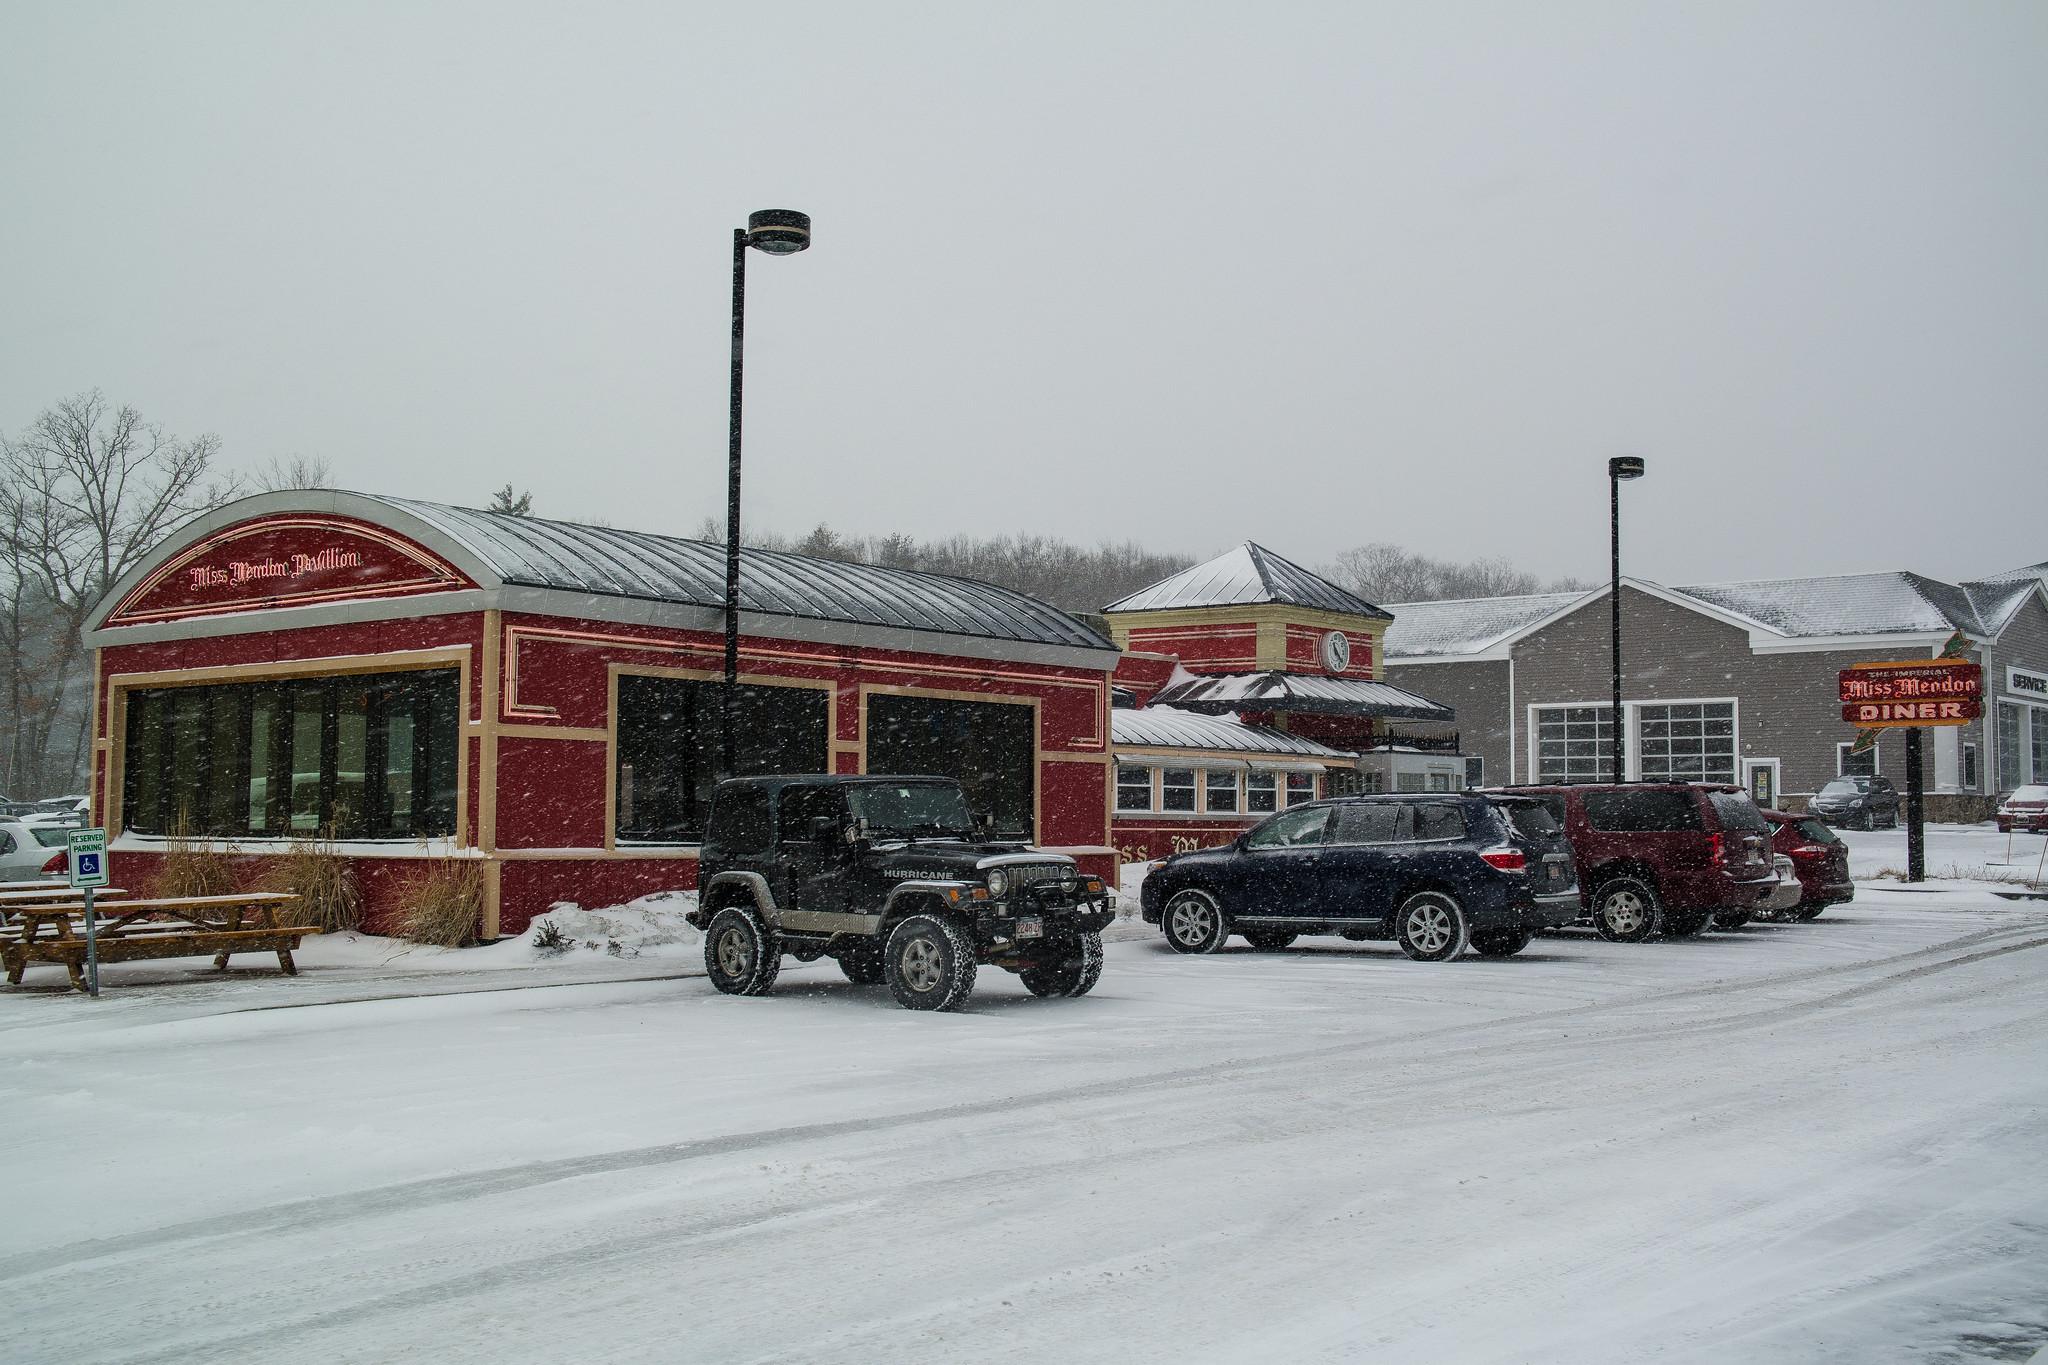 Snowy Miss Mendon Diner